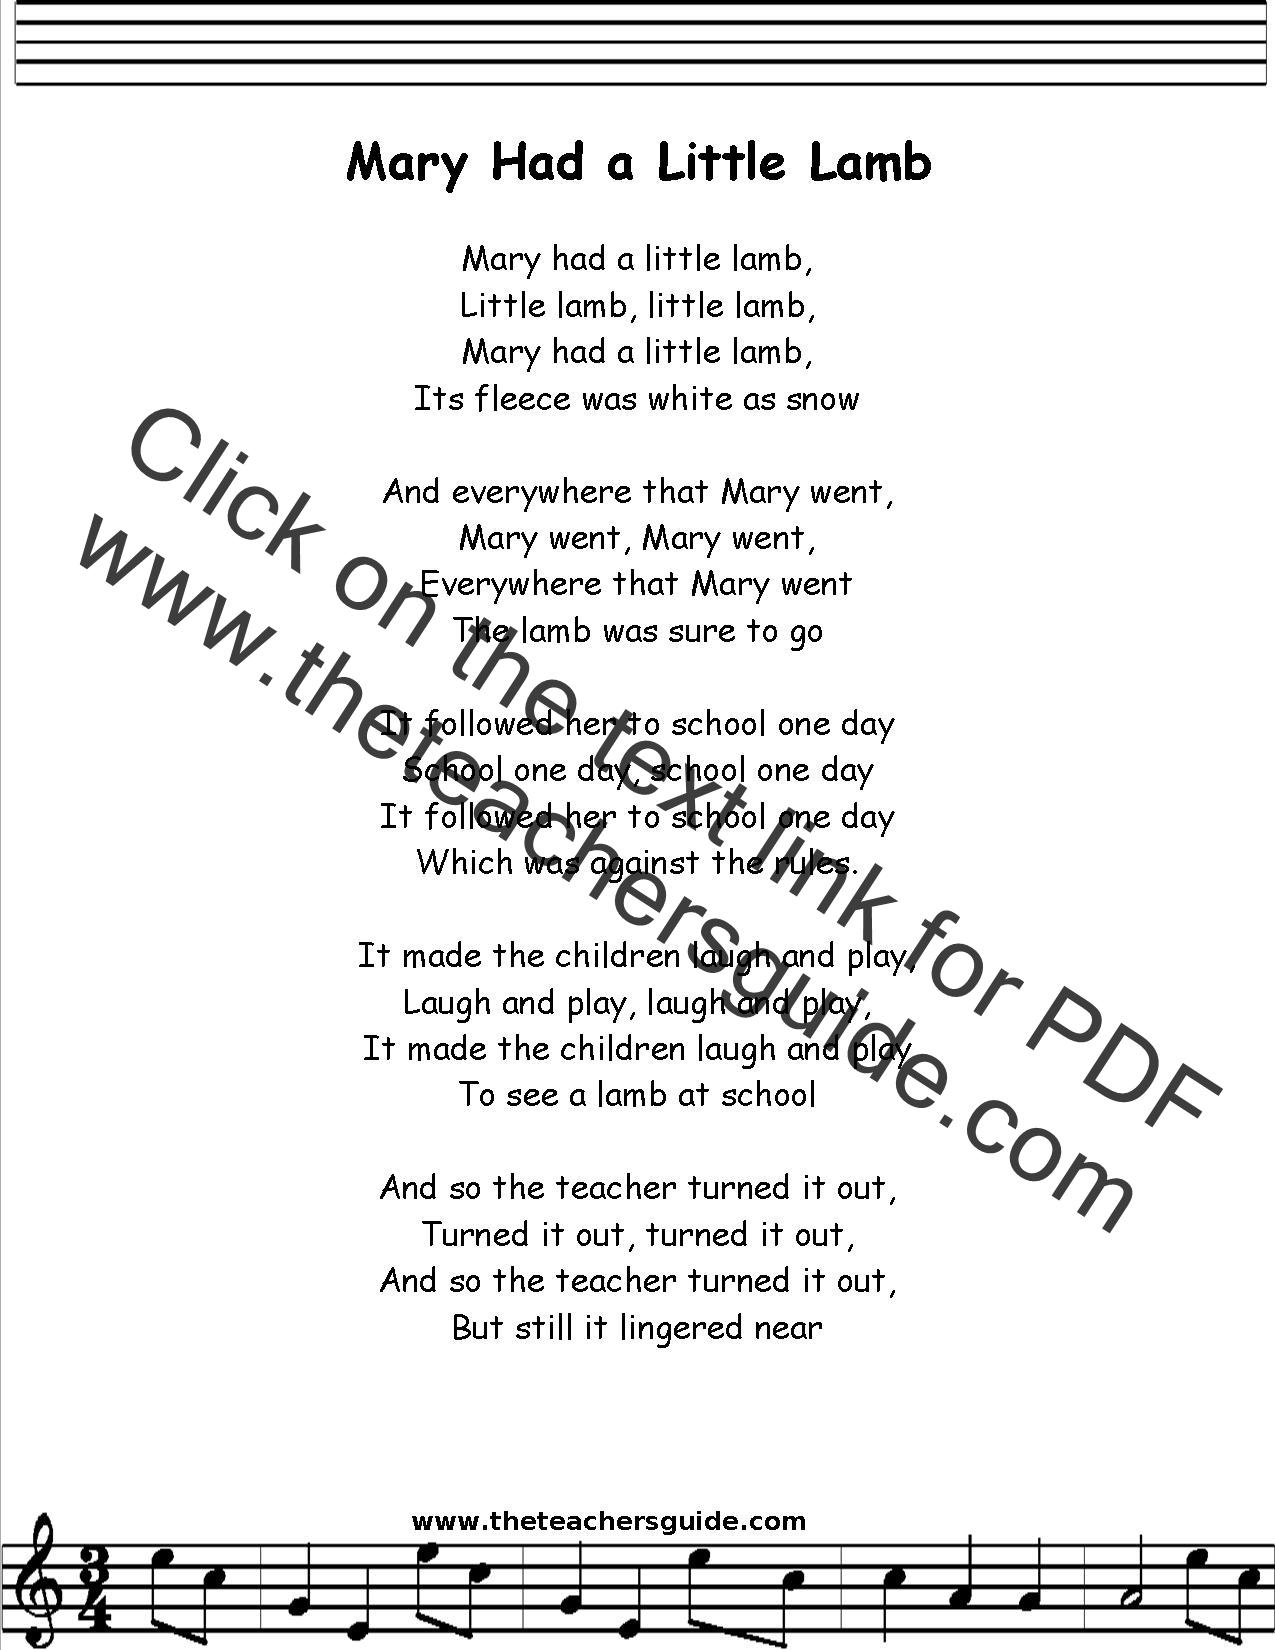 Mary Had A Little Lamb Lyrics Printout Midi And Video